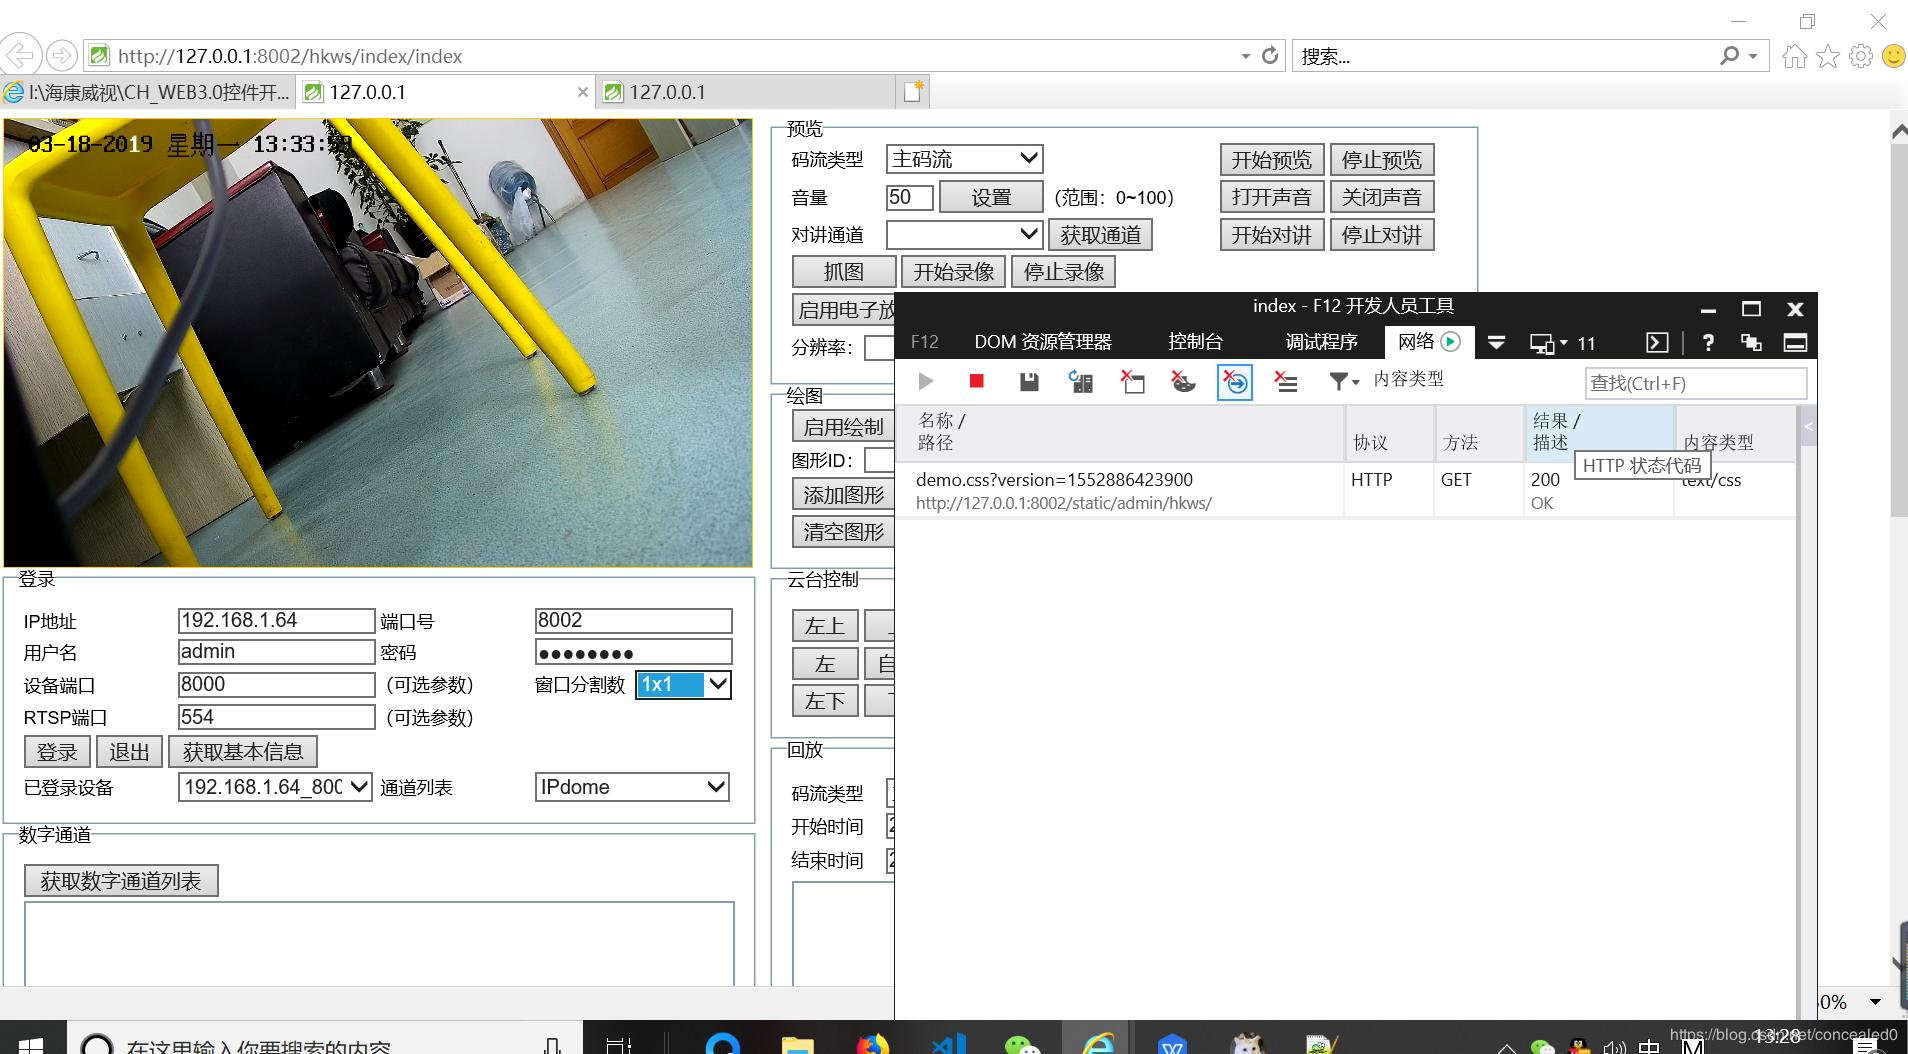 Hikvision web3 0 development common error 404,403